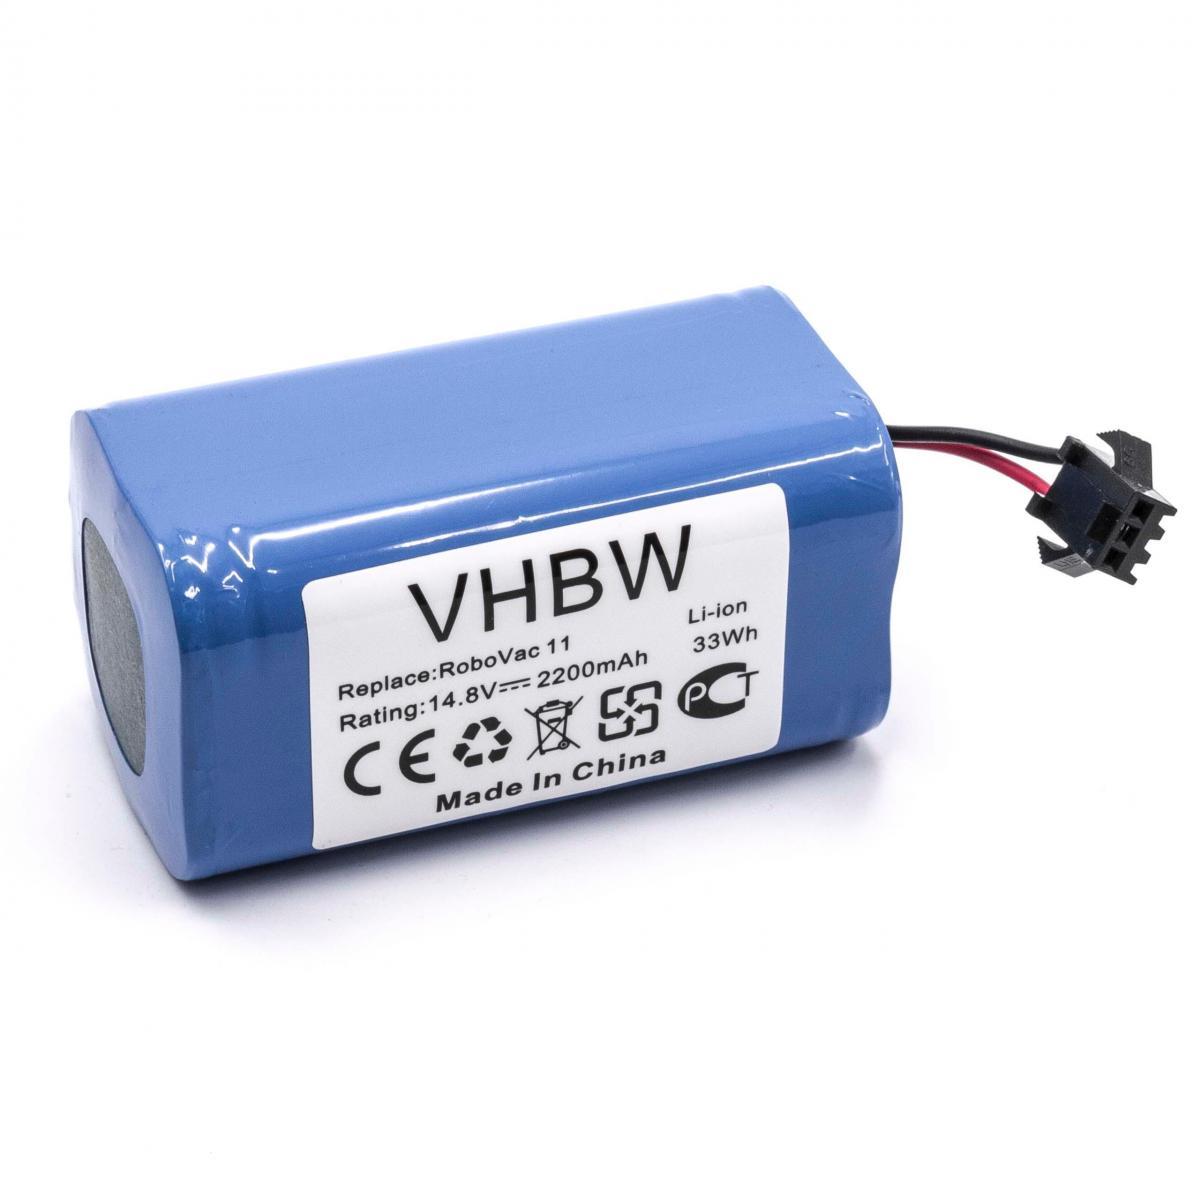 Vhbw vhbw batterie compatible avec Ecovacs Deebot 601, 605, DN622 robot électroménager (2200mAh, 14,8V, Li-ion)